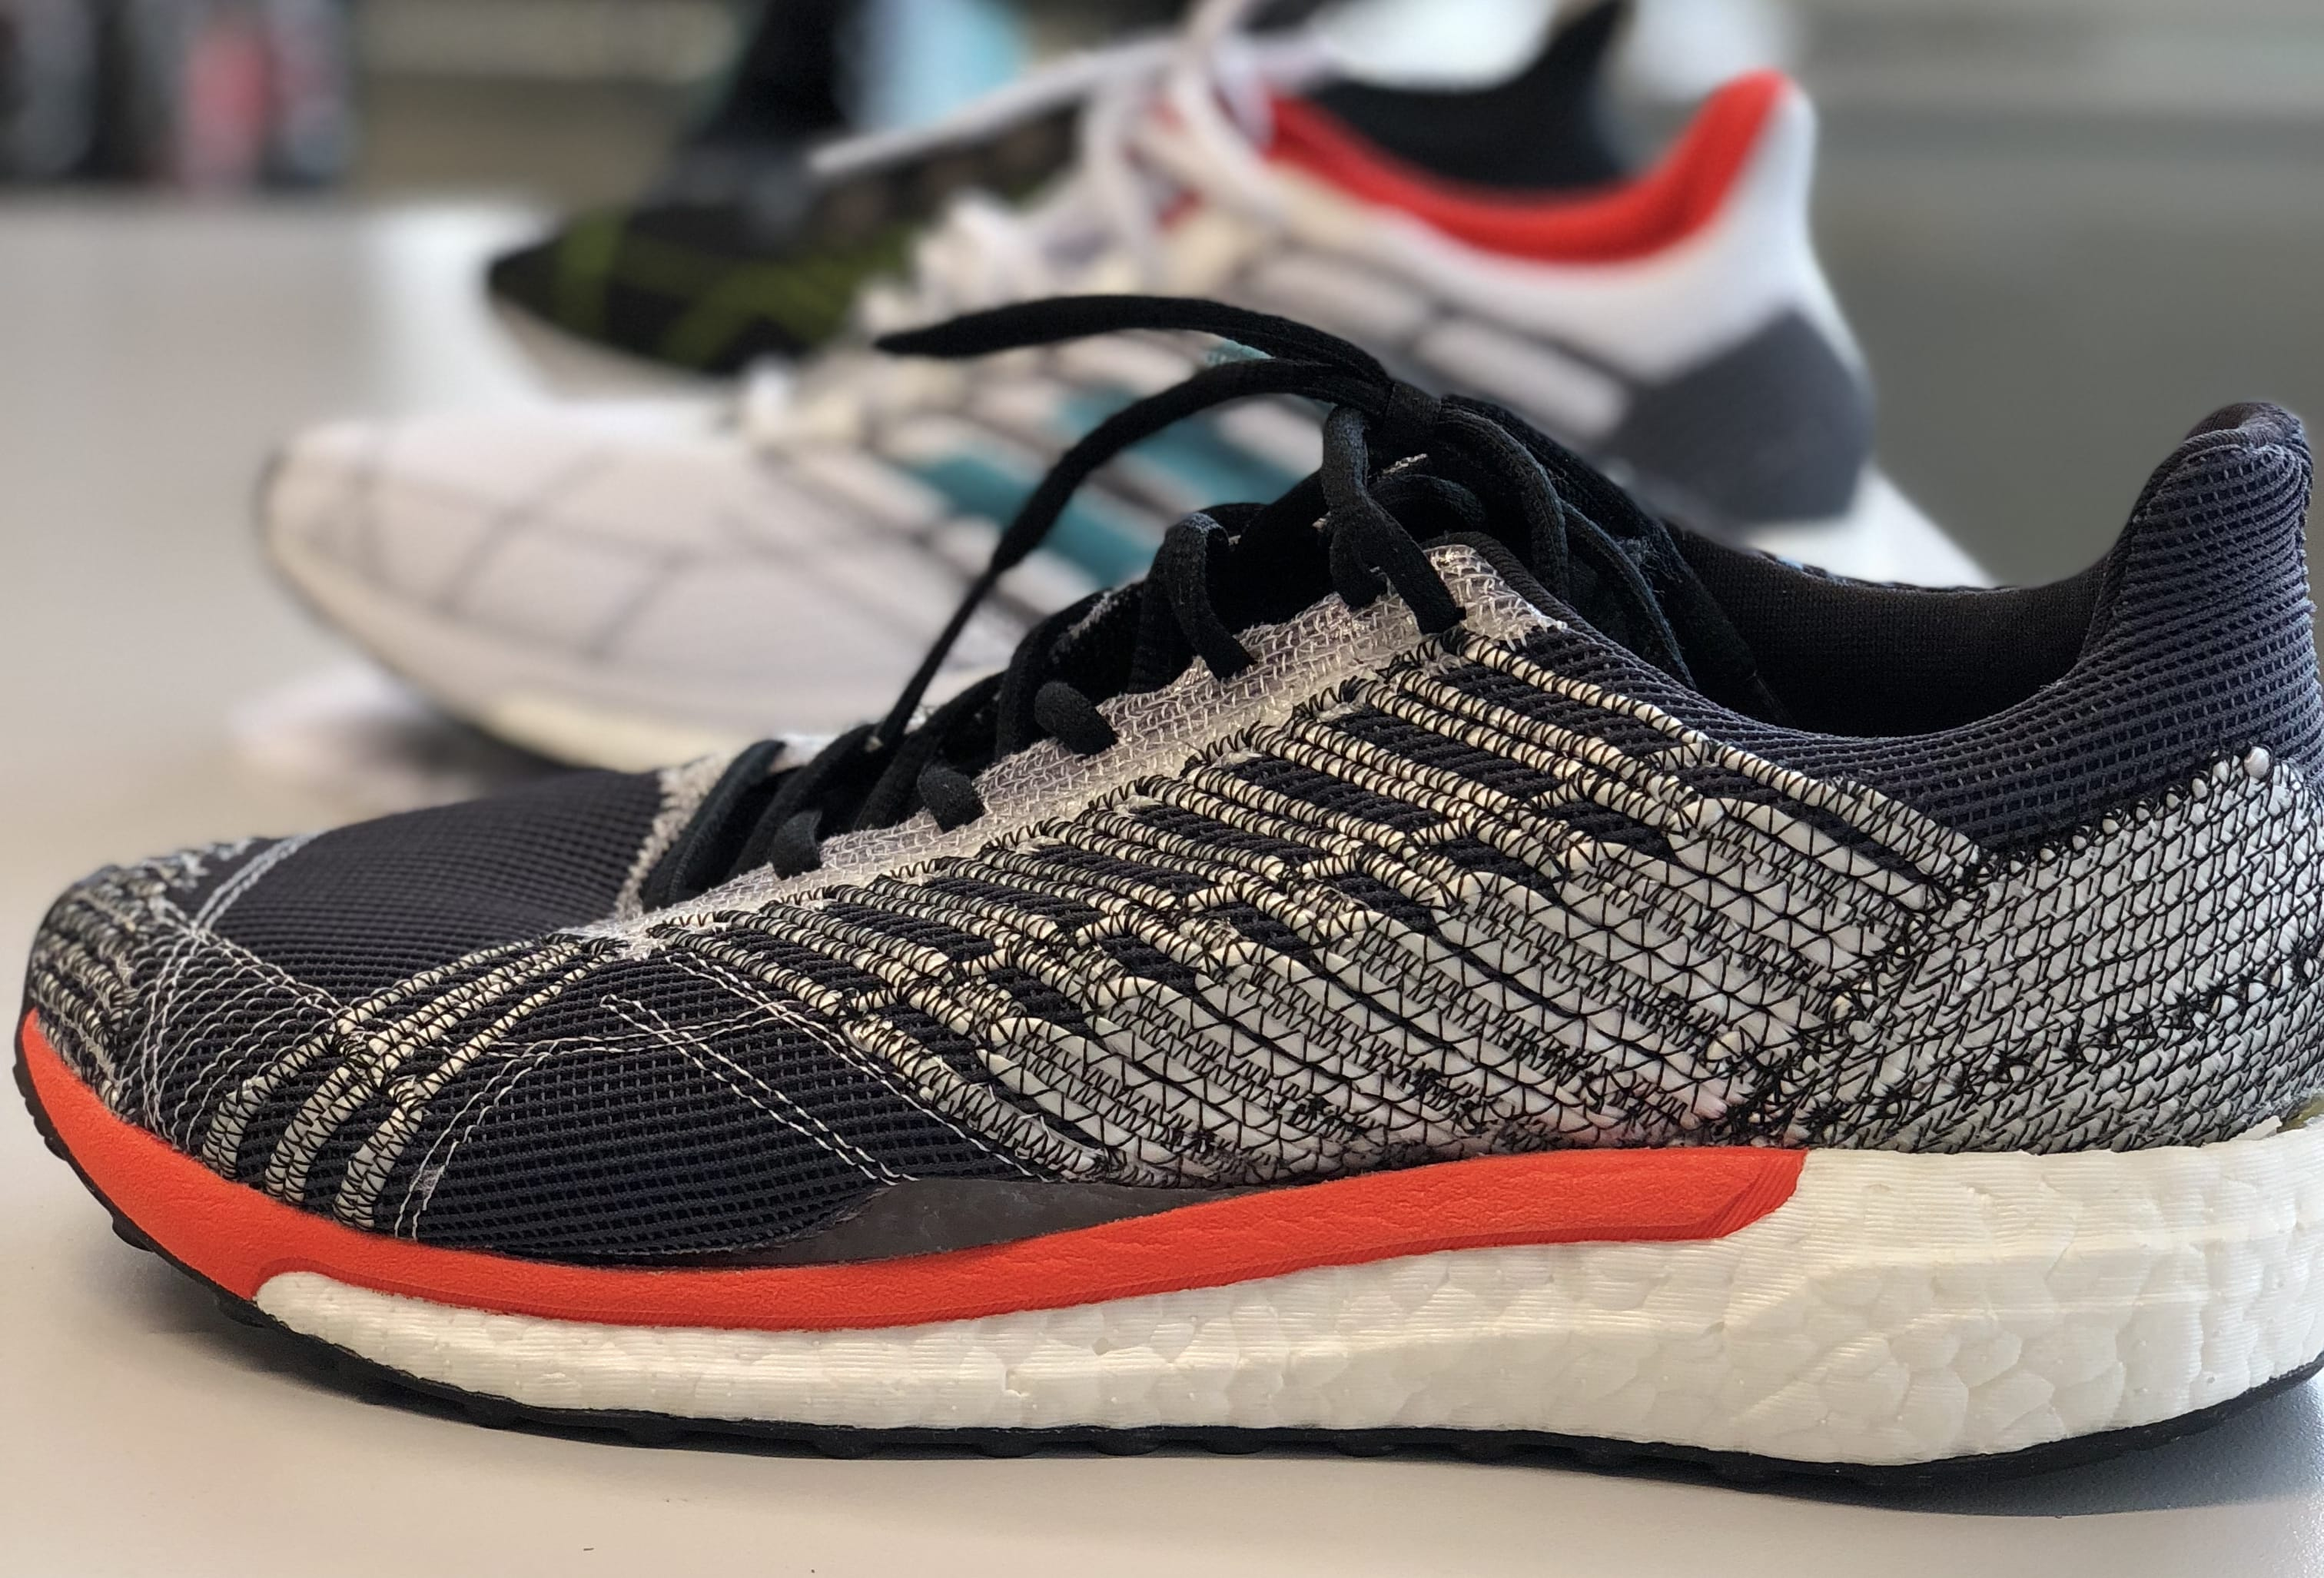 02187cd2d75fc Adidas Tailored Fiber Placement Technology